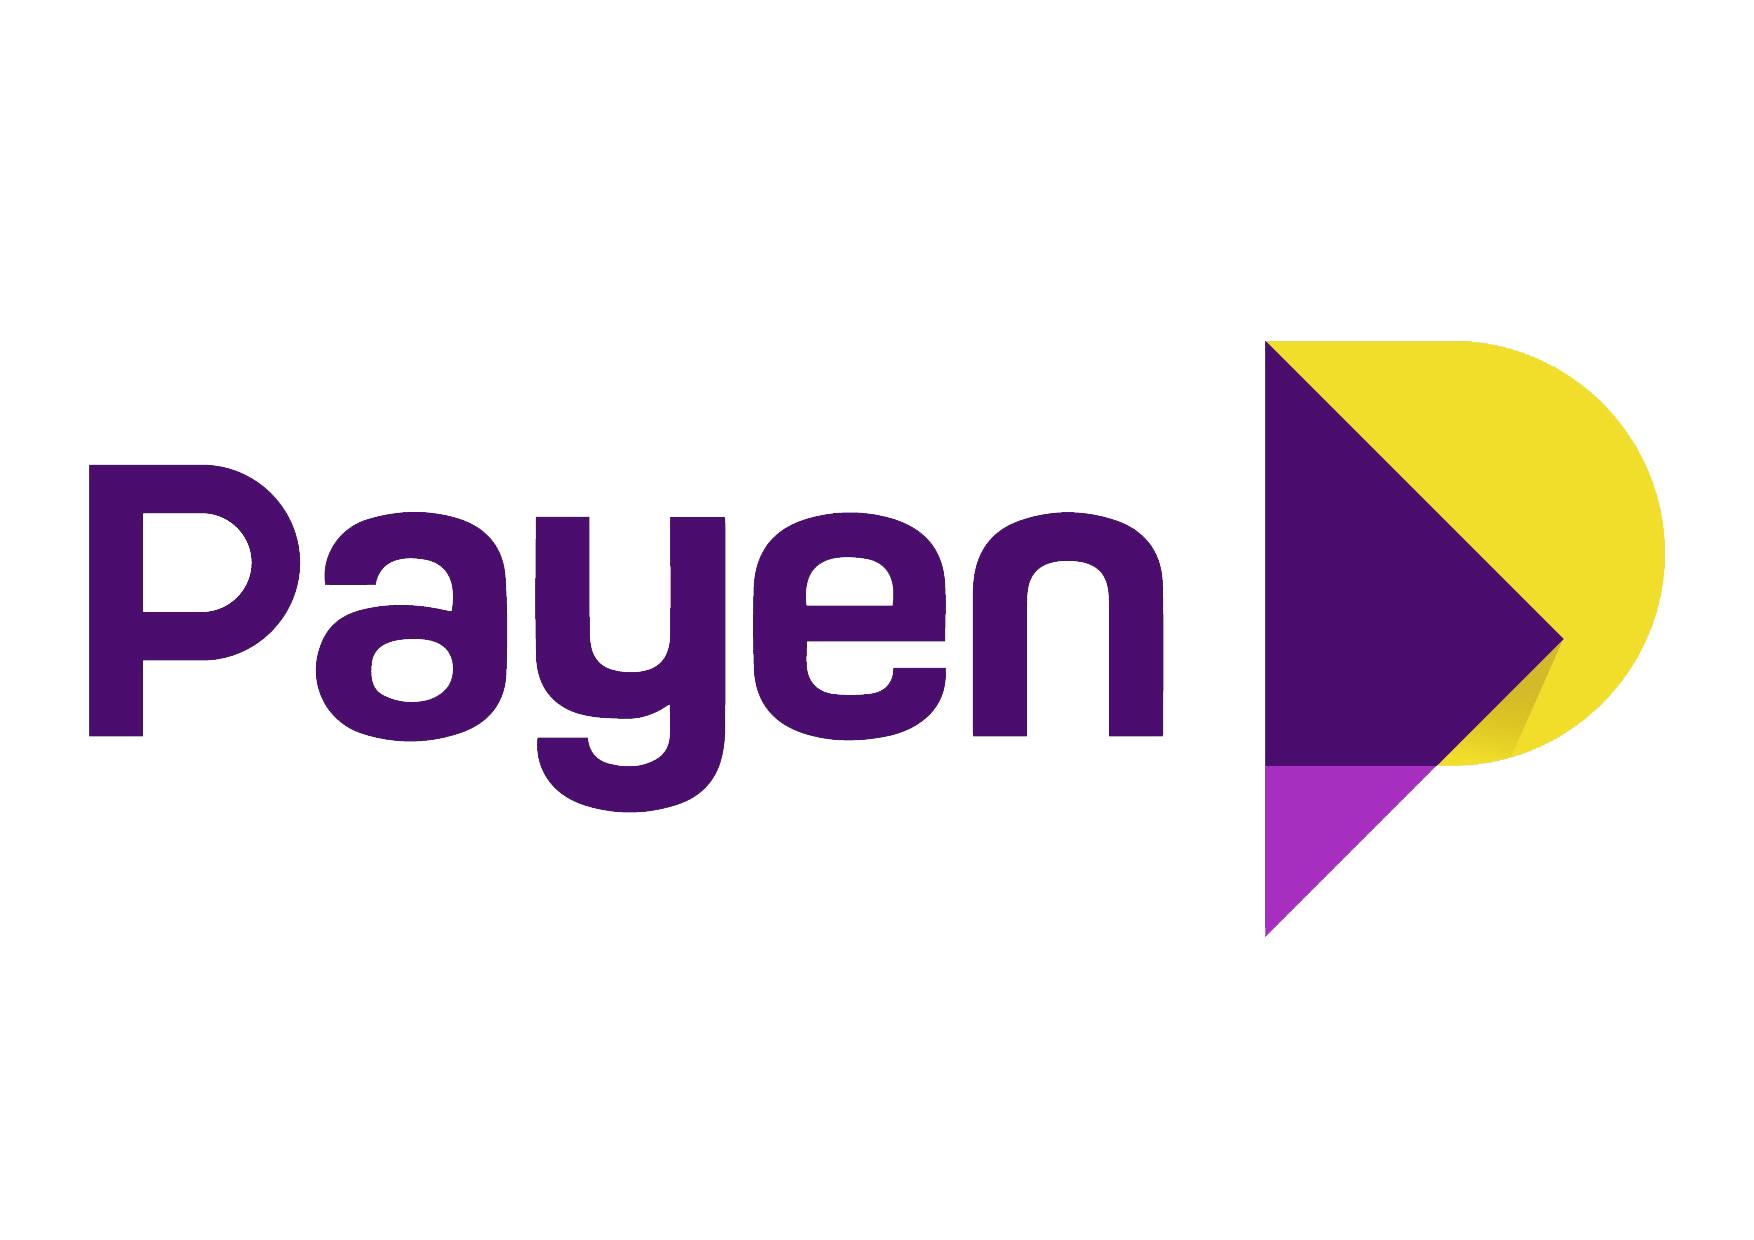 2019-05-15 Payen Logo (Large)_White_Background.jpg